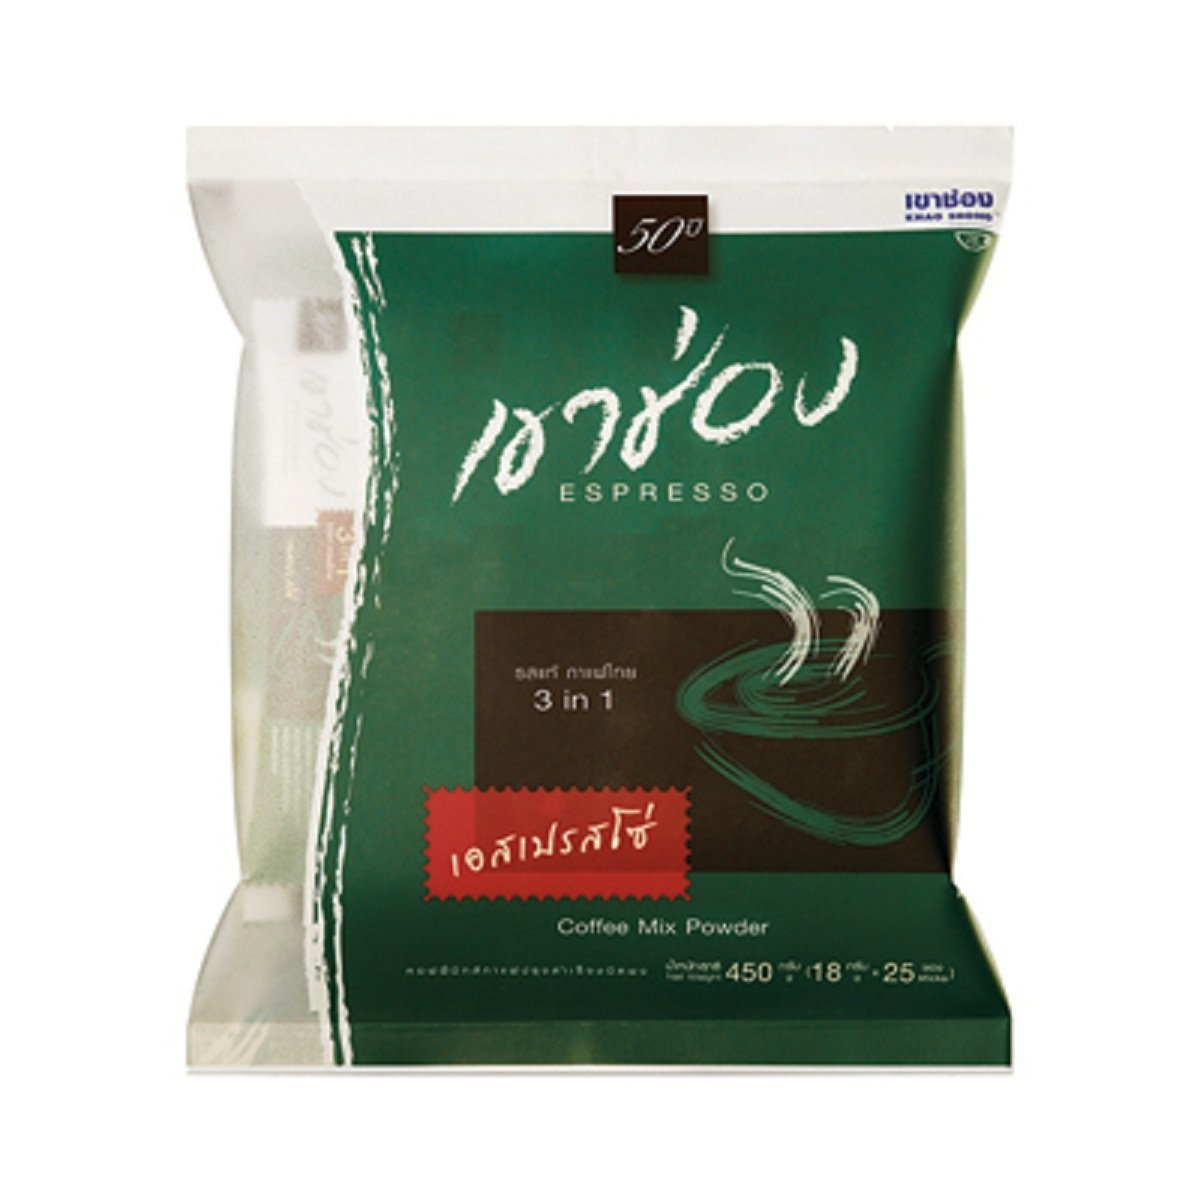 Khao Shong Thai Instant Coffee Mix Powder 3 in 1 Espresso Made